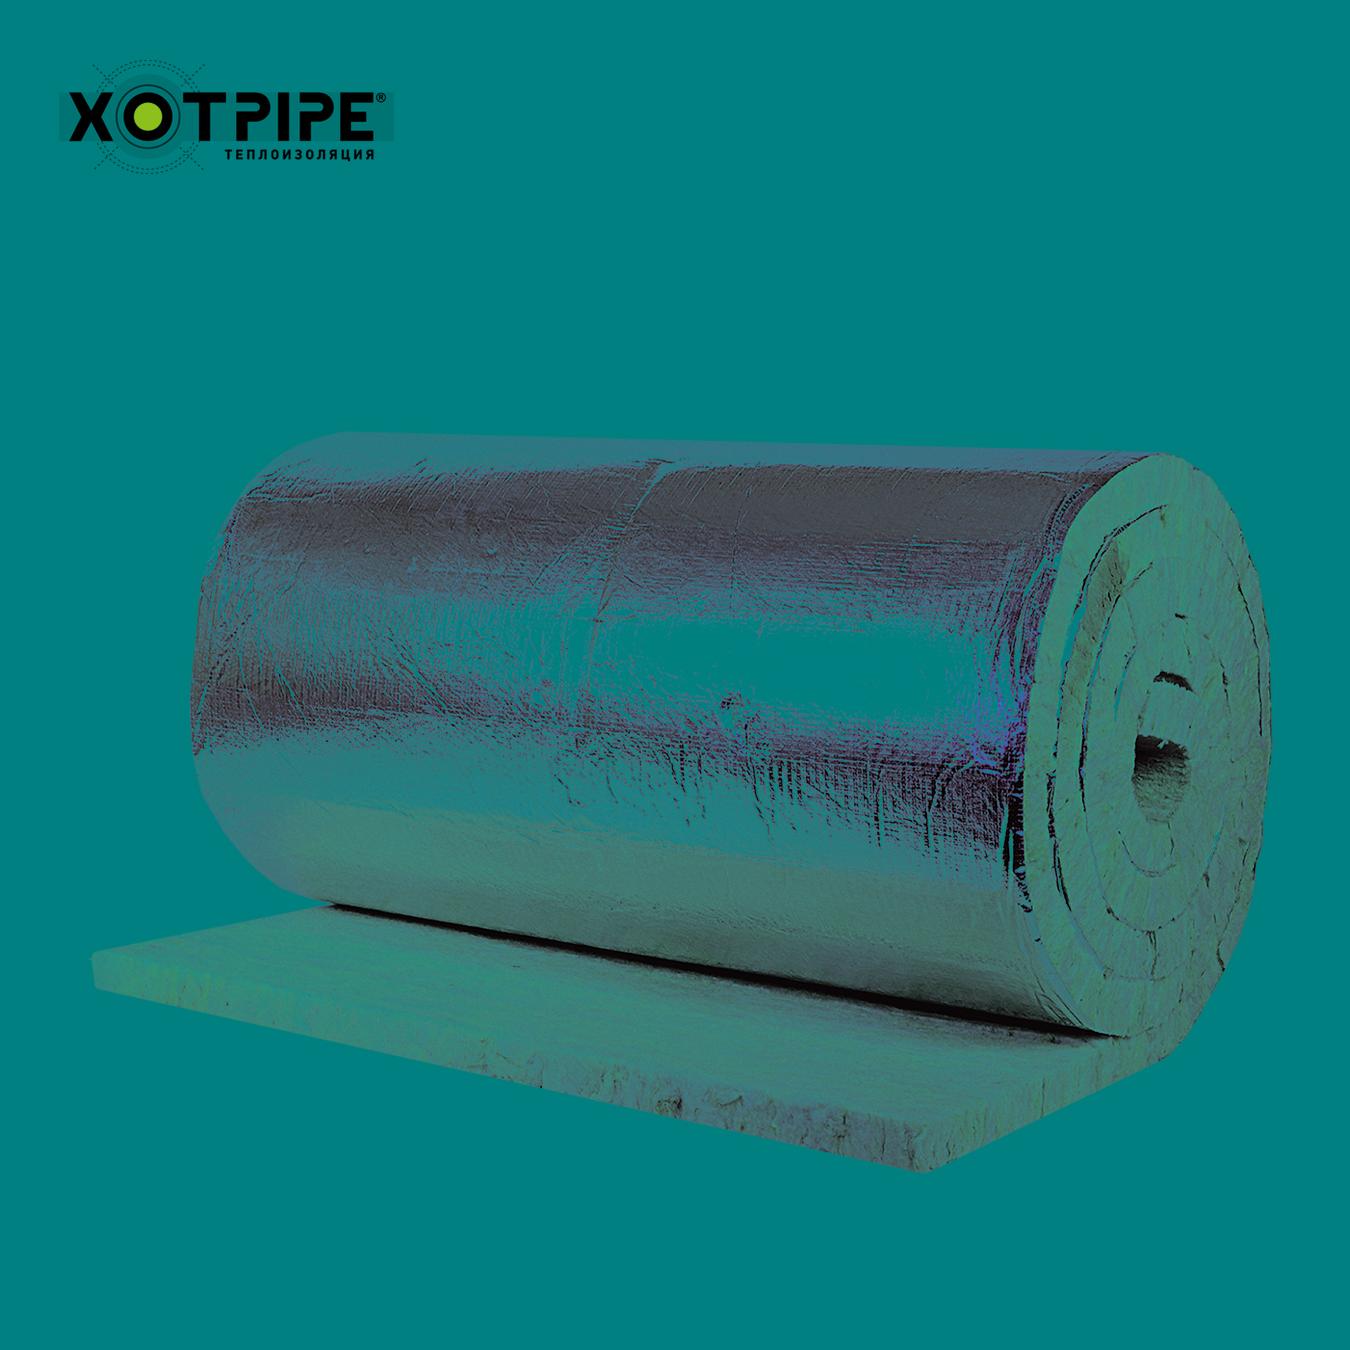 Ламельный мат XOTPIPE плот.50кг/м.куб., толщ.30мм